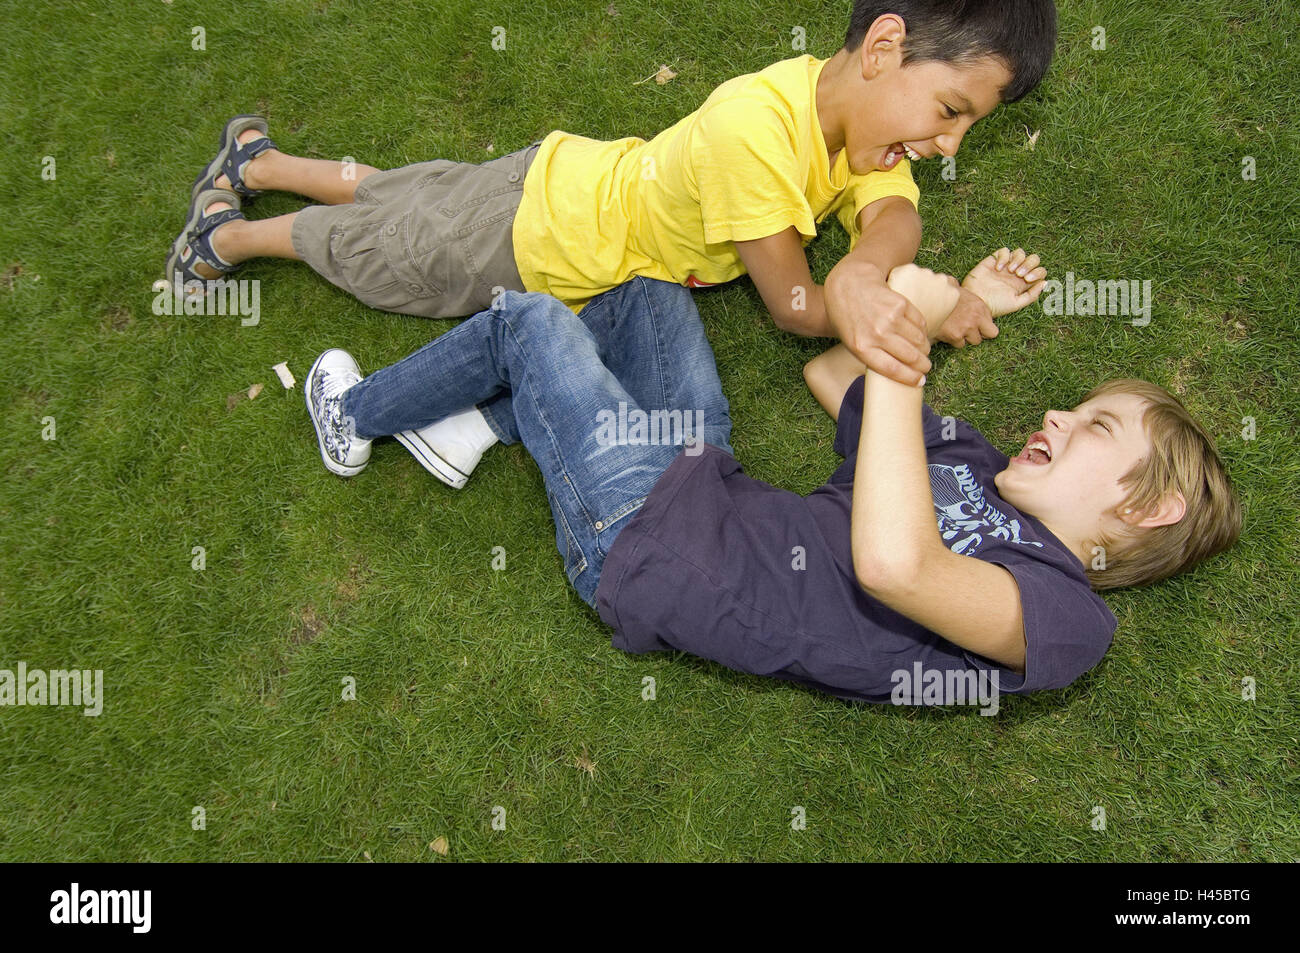 Boys, two, turfs, lie, scuffle, model released, people, children, friends, outside, meadow, park, fight, fight, - Stock Image